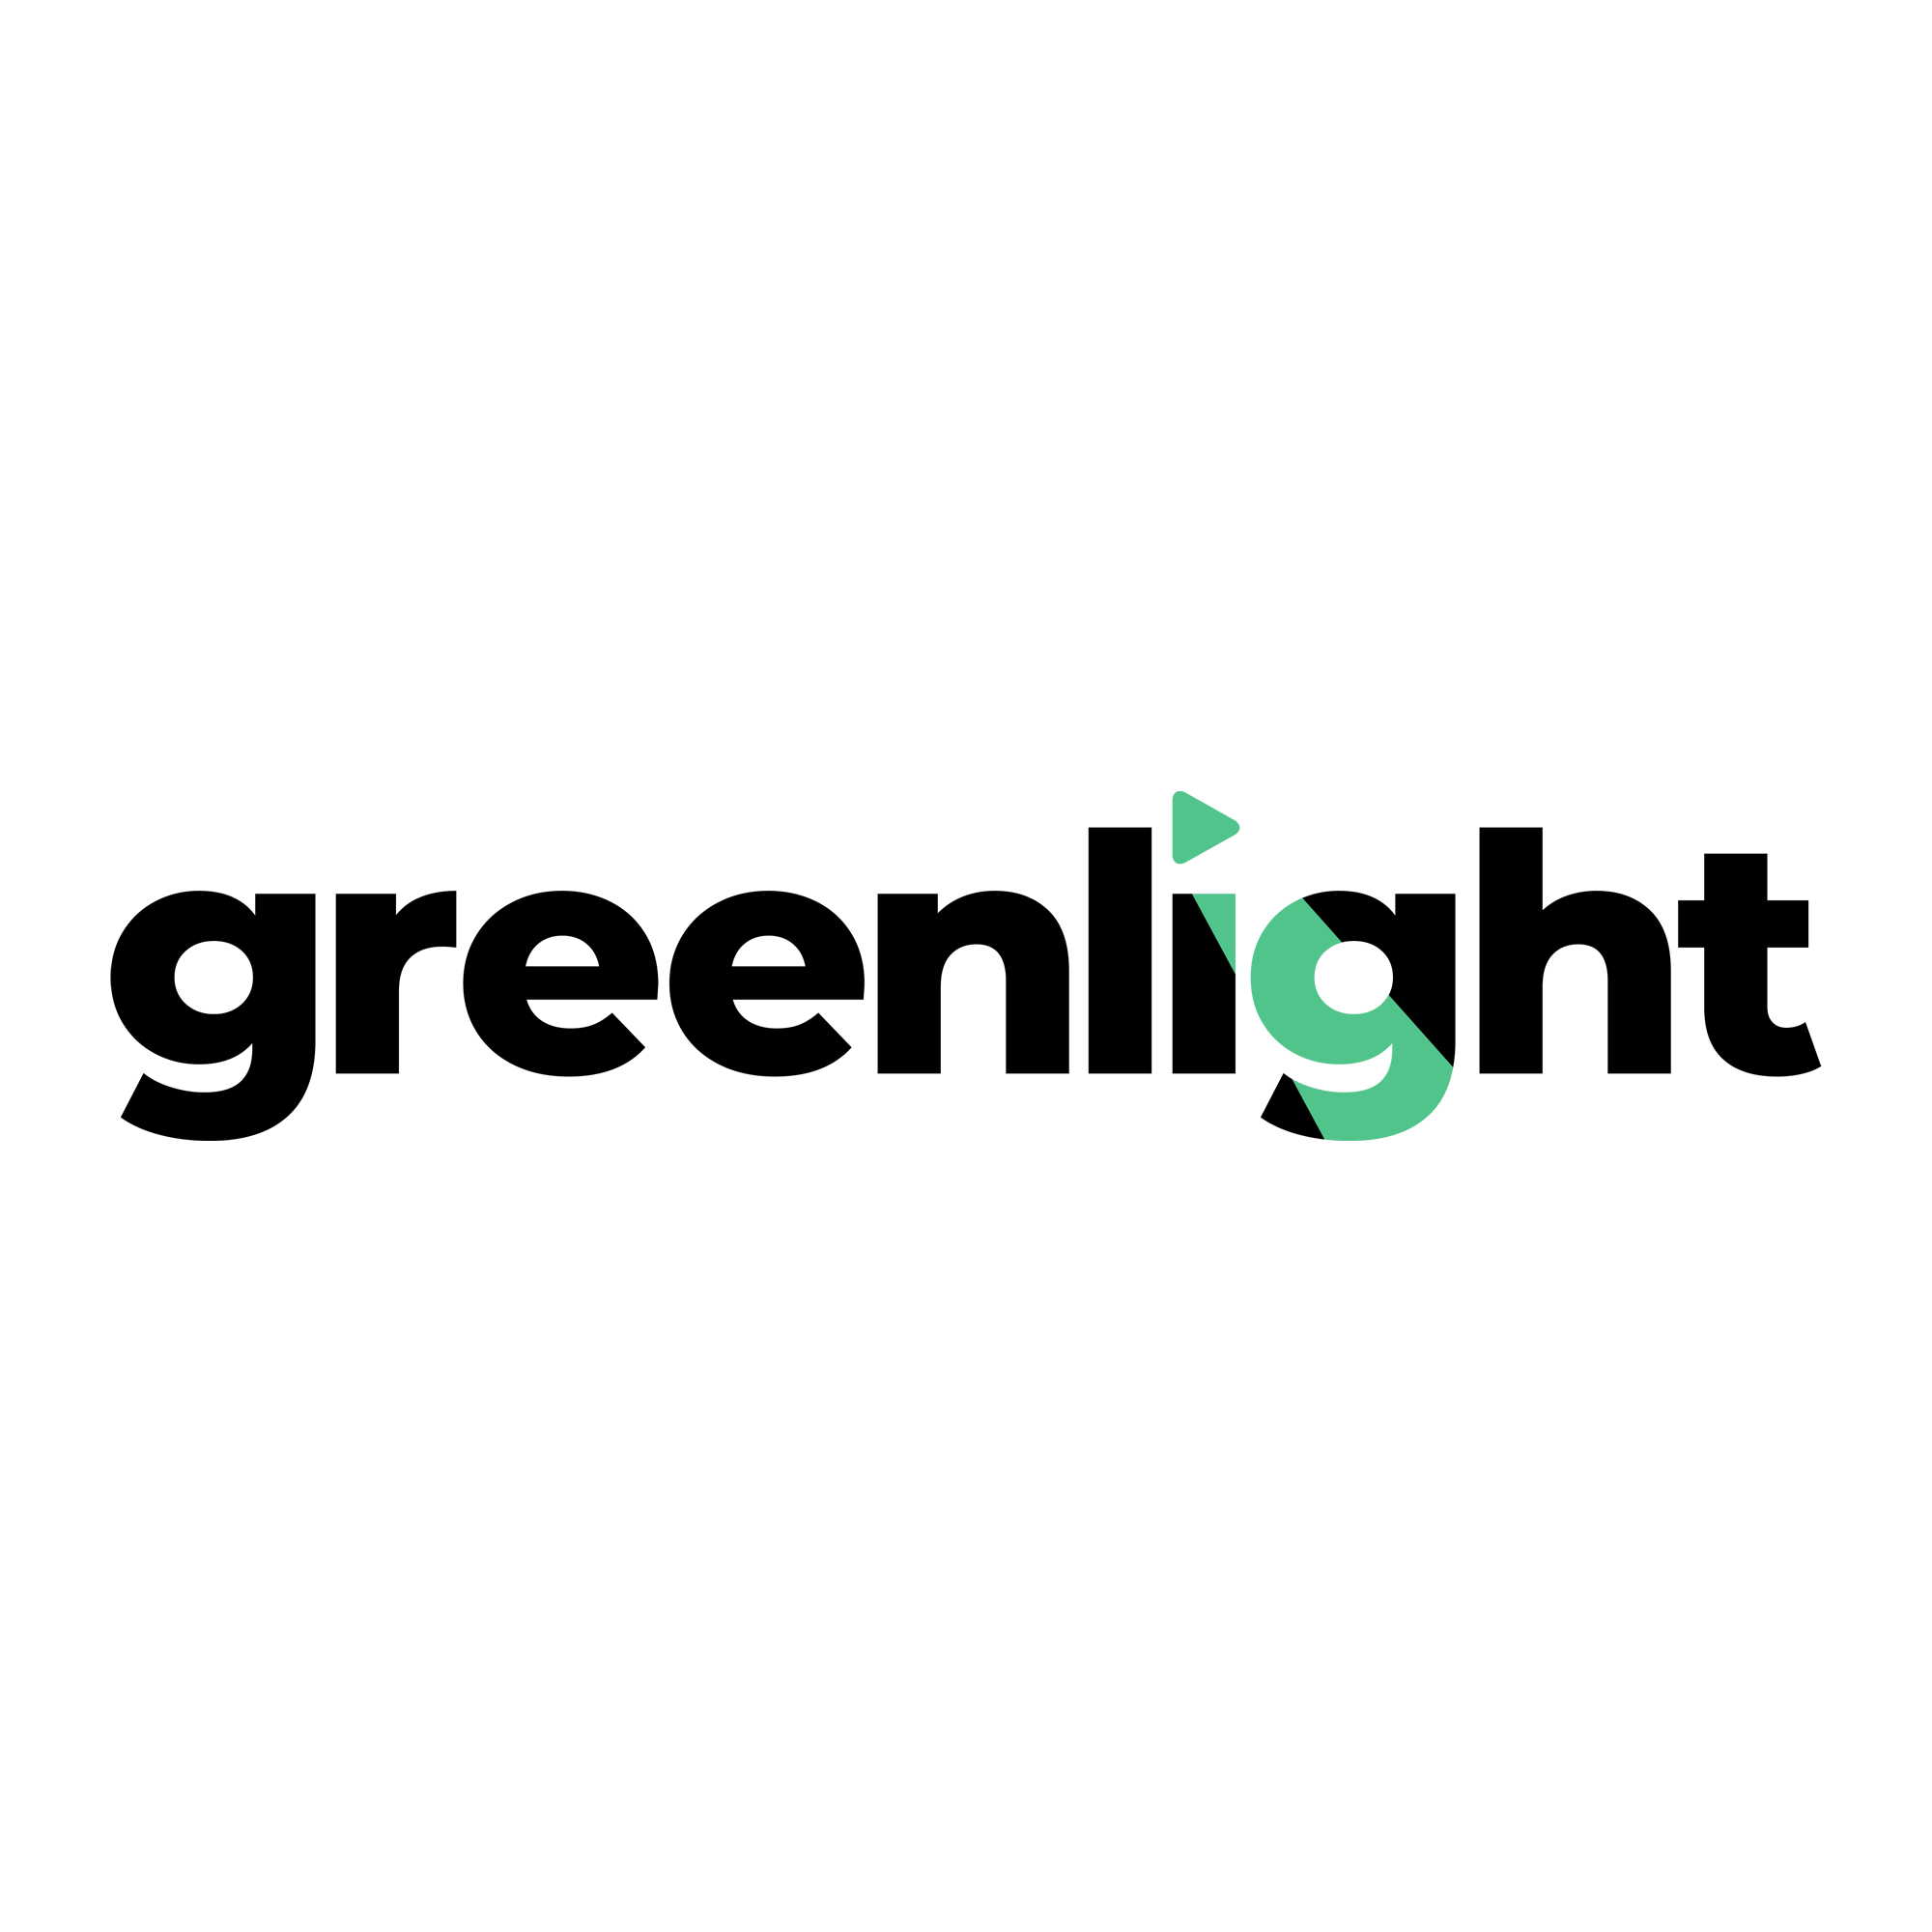 Greenlight Homepage